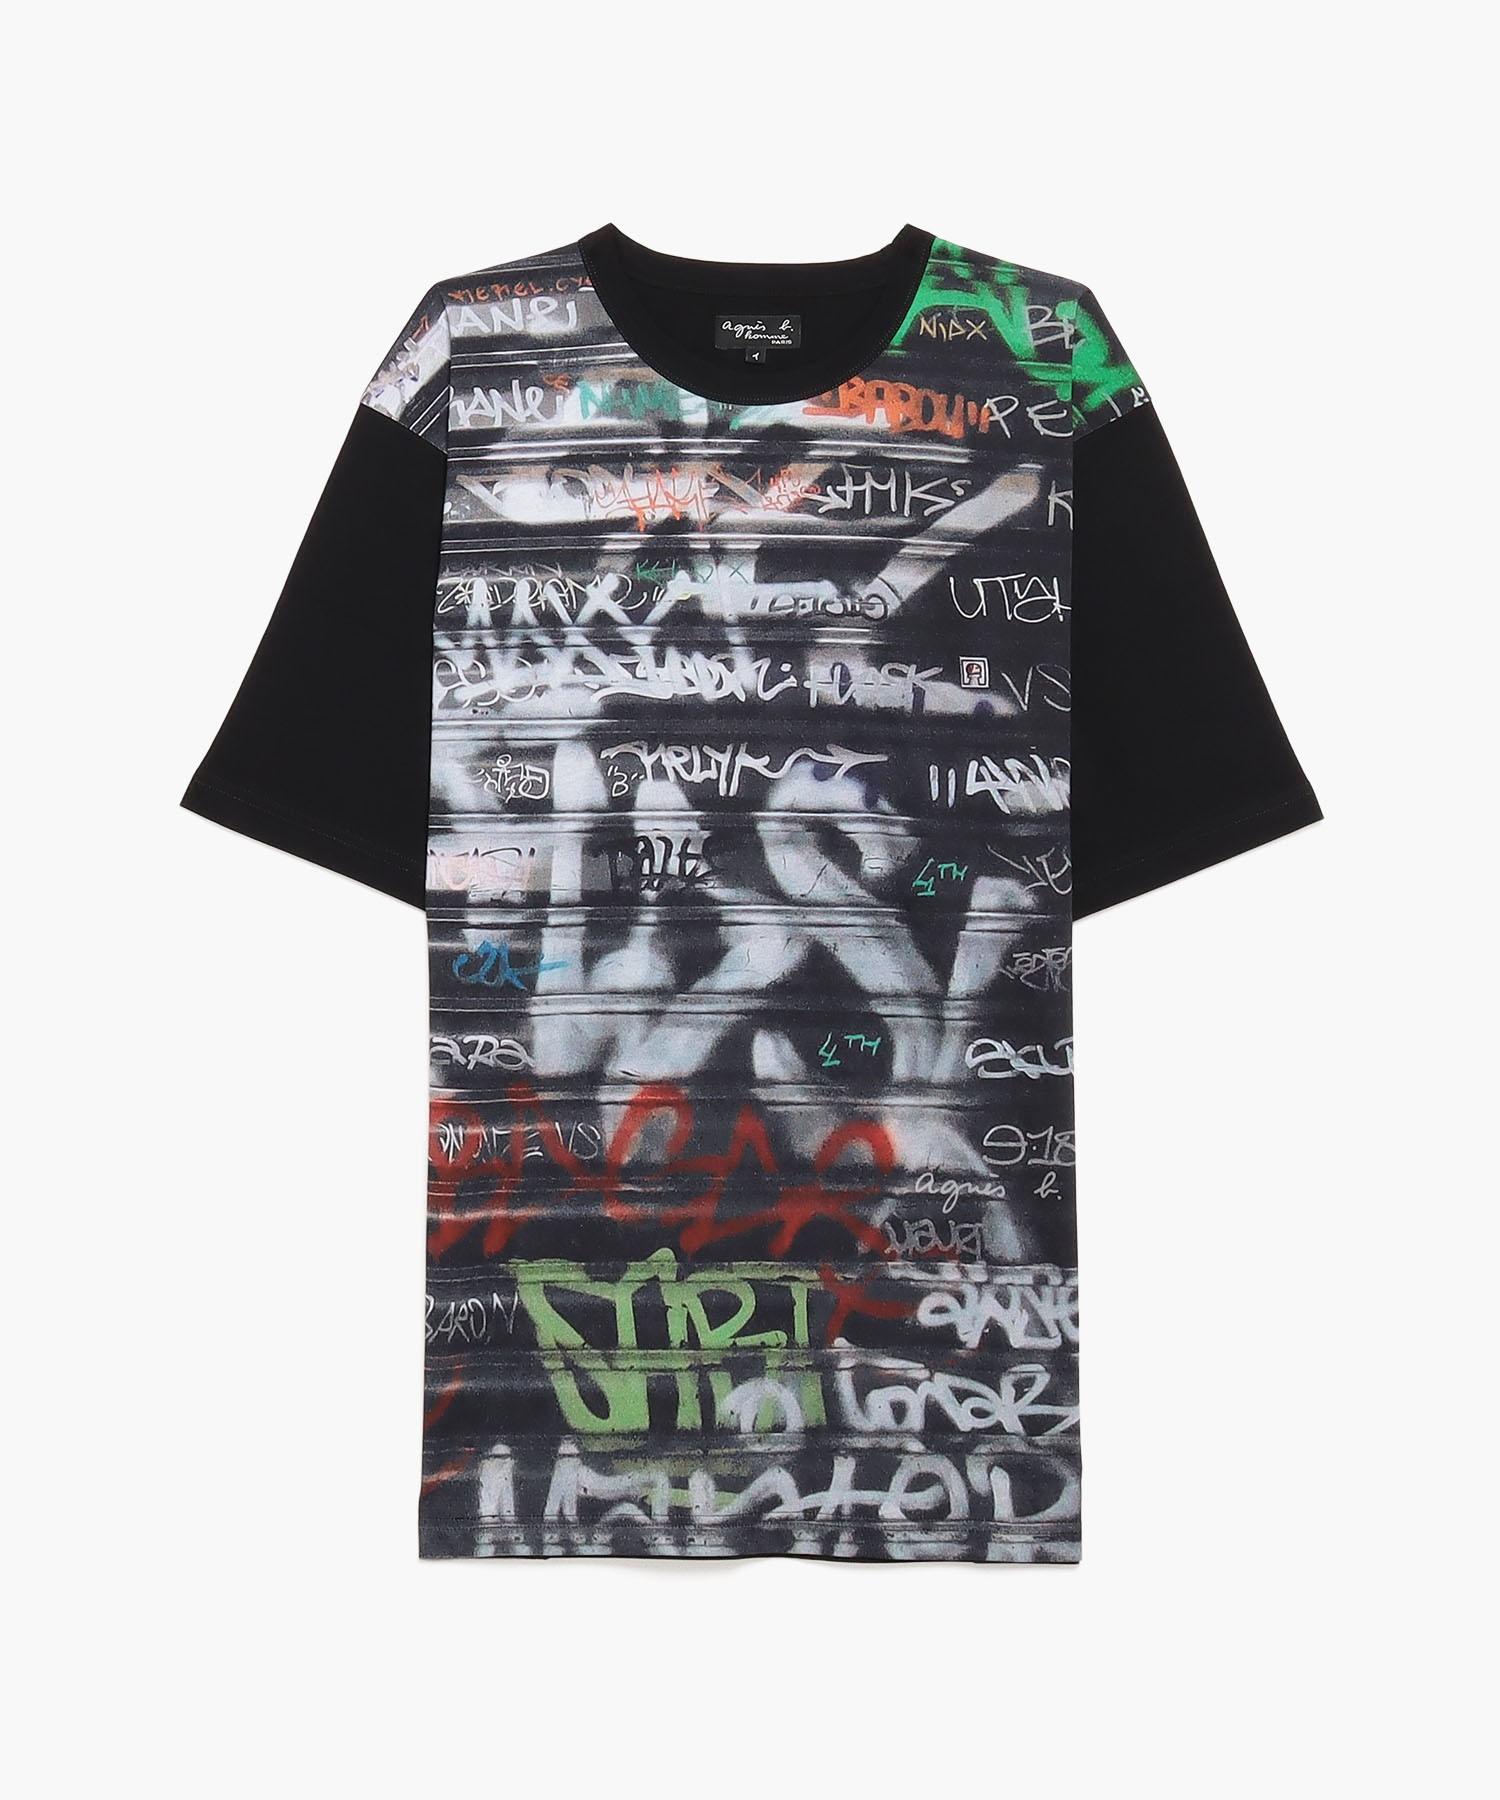 NT04 TS CHRIS MC フォトプリントTシャツ